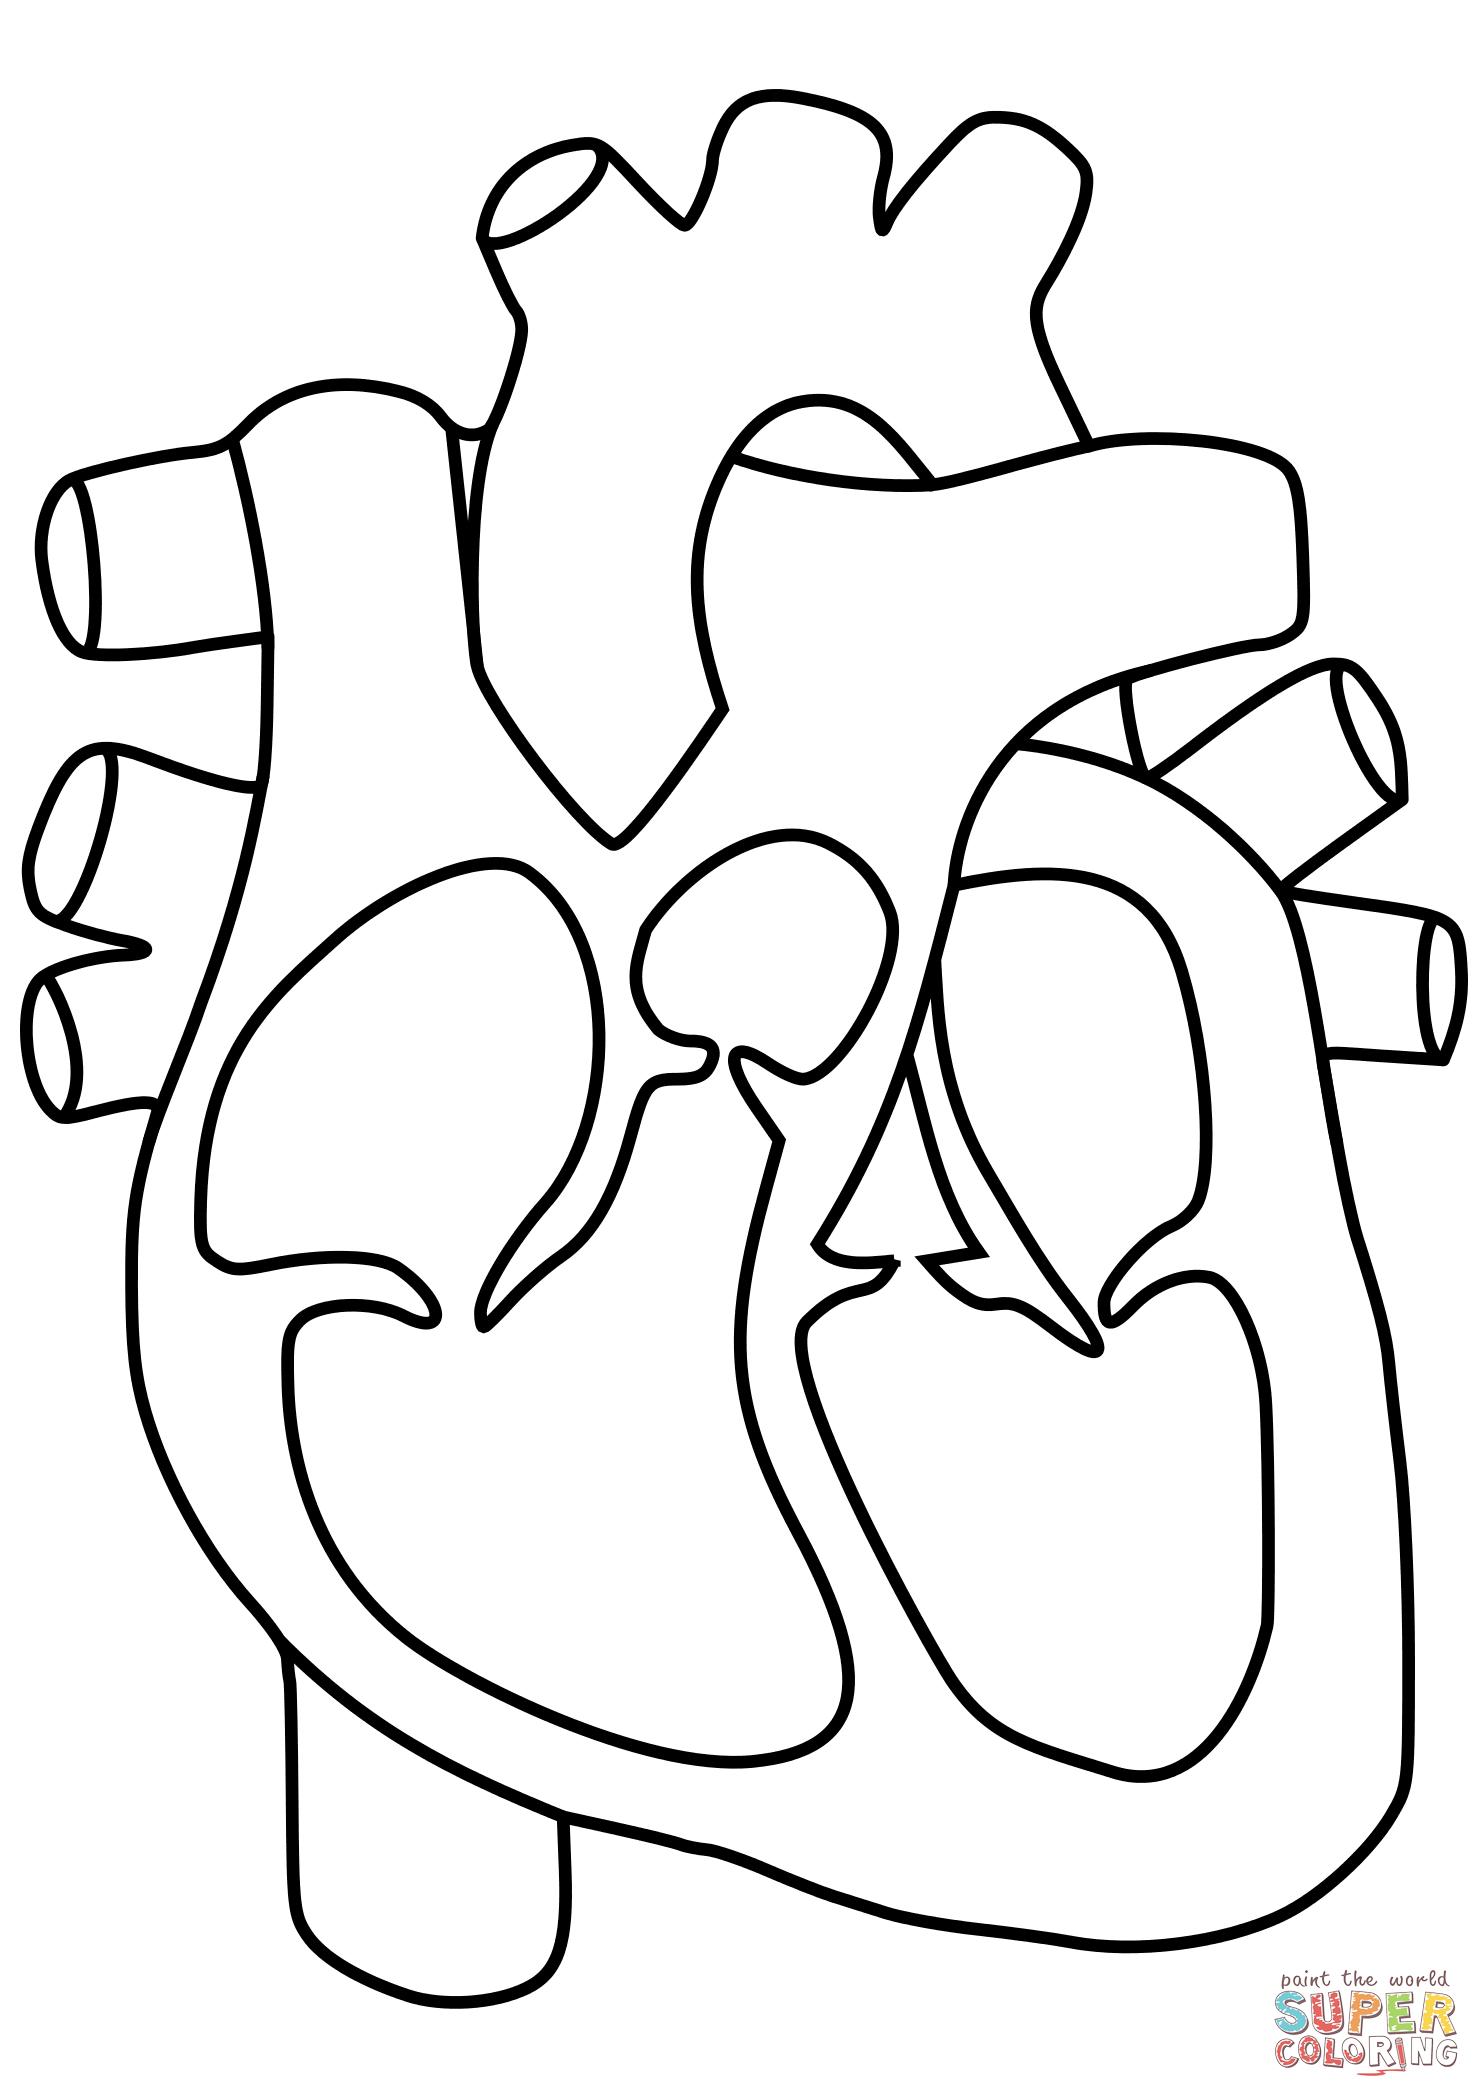 Human Heart Line Drawing At Getdrawings